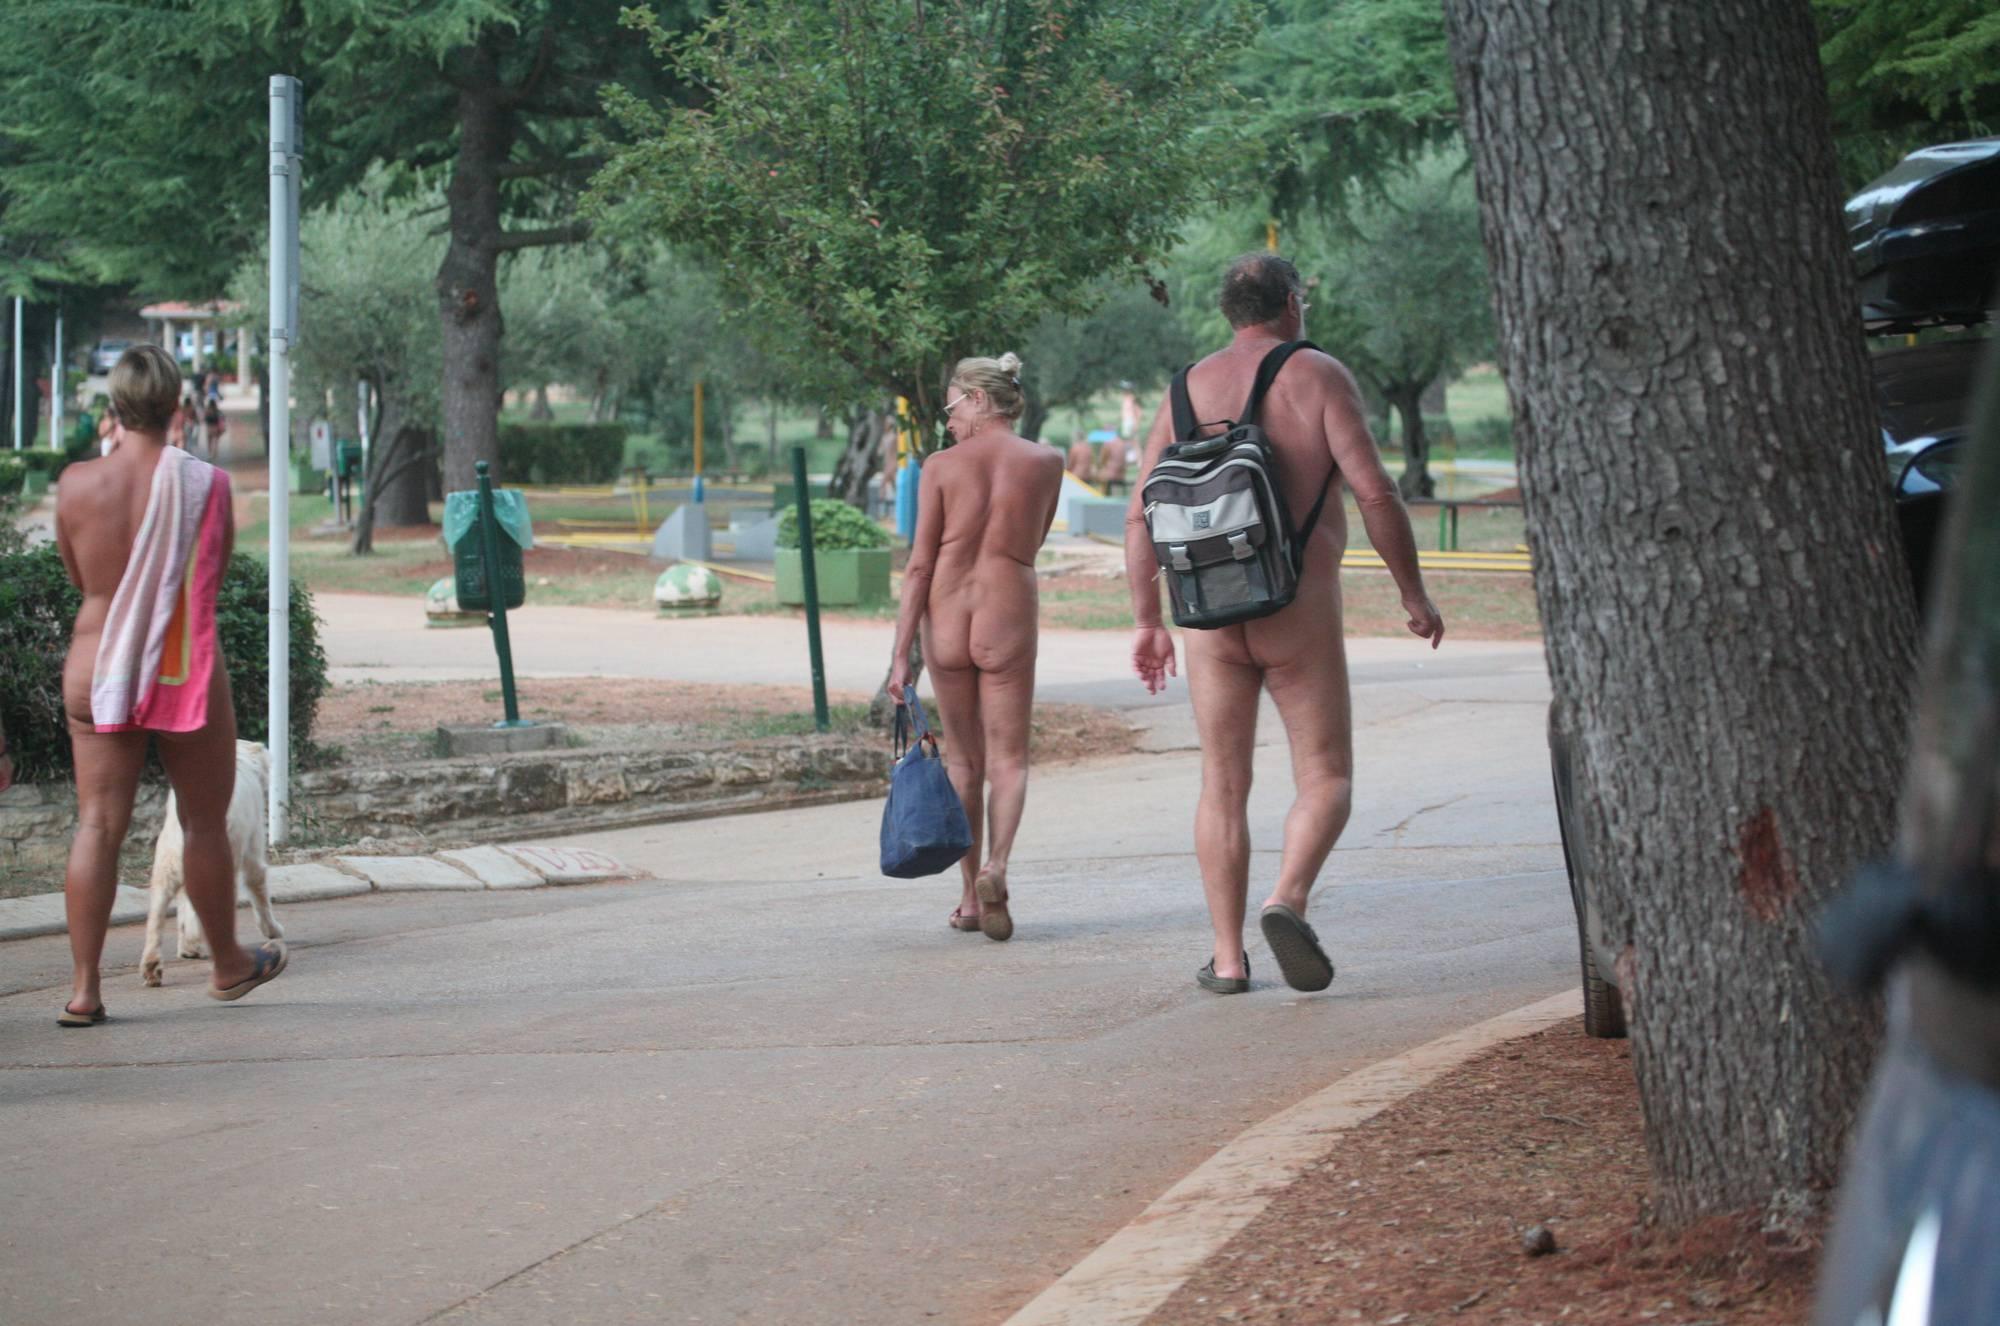 Purenudism Pics-Nude Road Crossing Cuts - 1